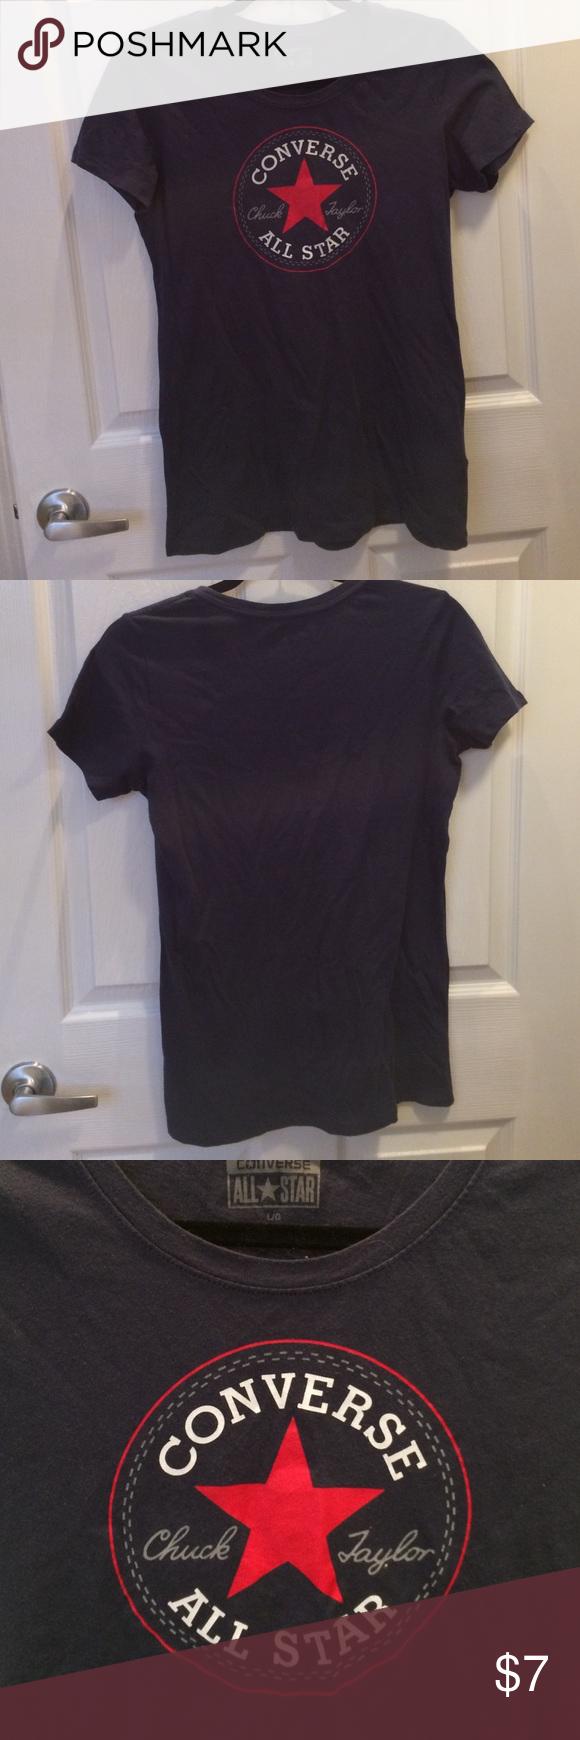 Converse Logo Shirt Dark navy blue converse logo shirt. Women's size large and 100% cotton Converse Tops Tees - Short Sleeve